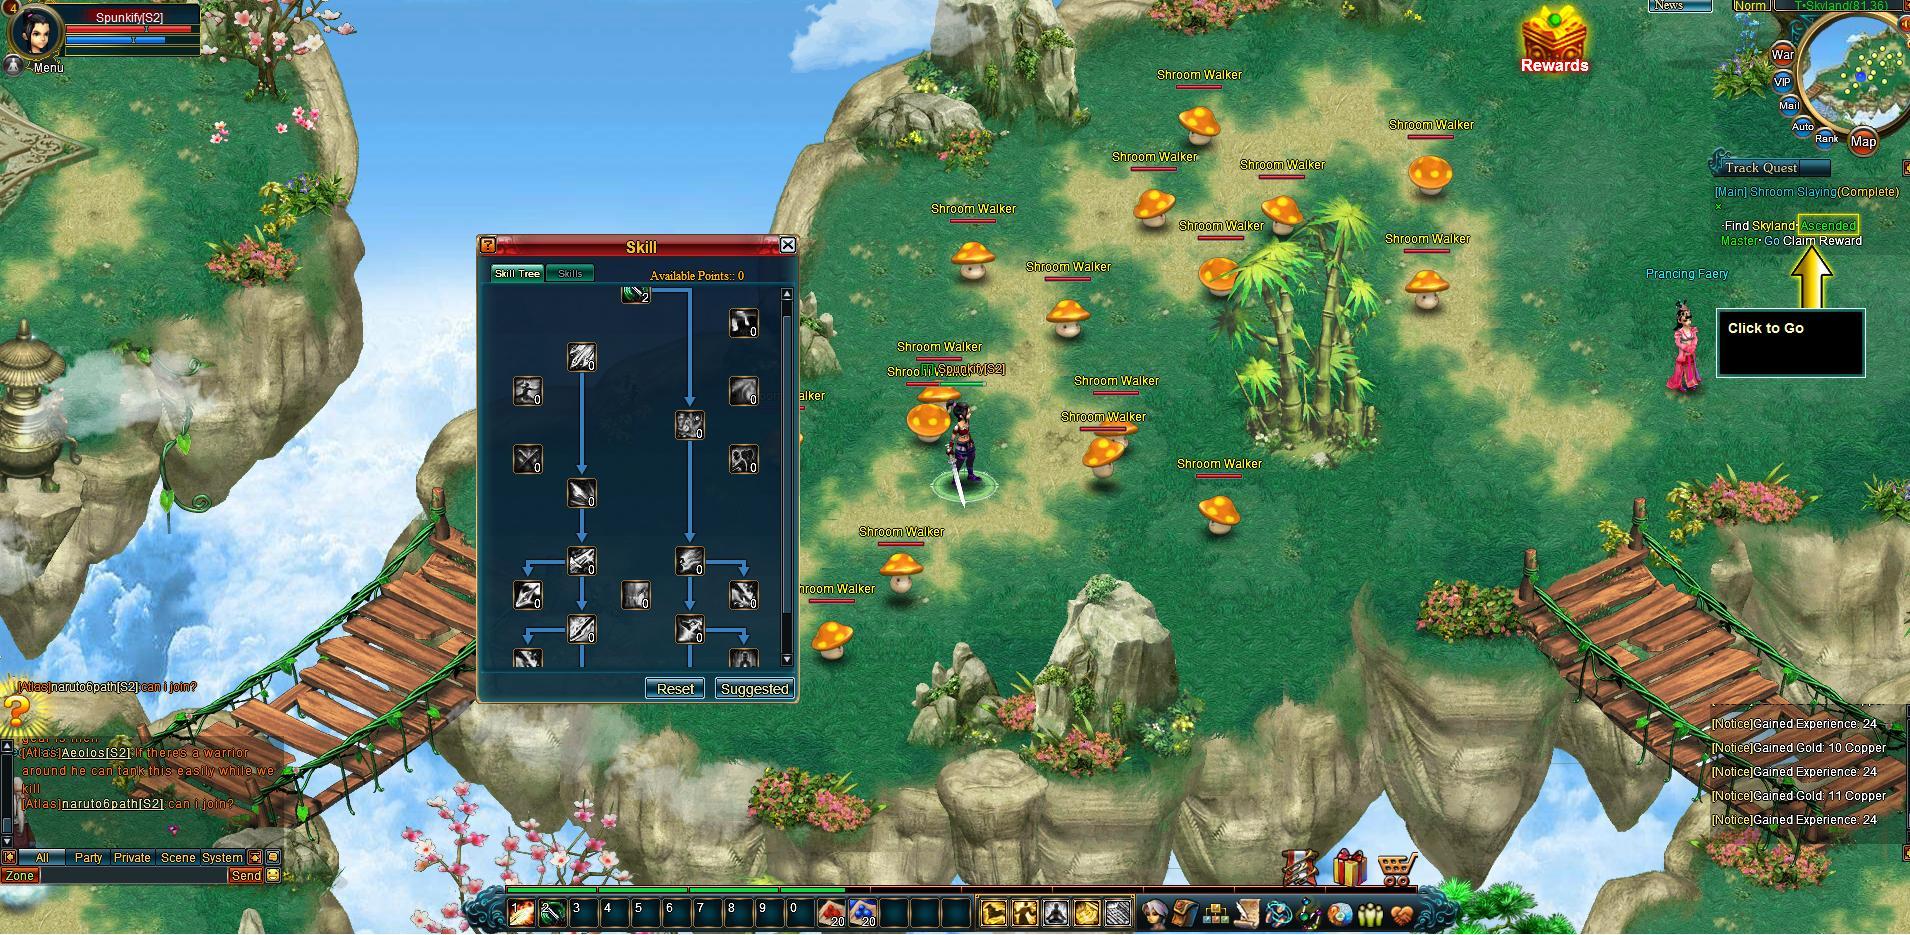 Mythic-Saga-ScreenShots-skills